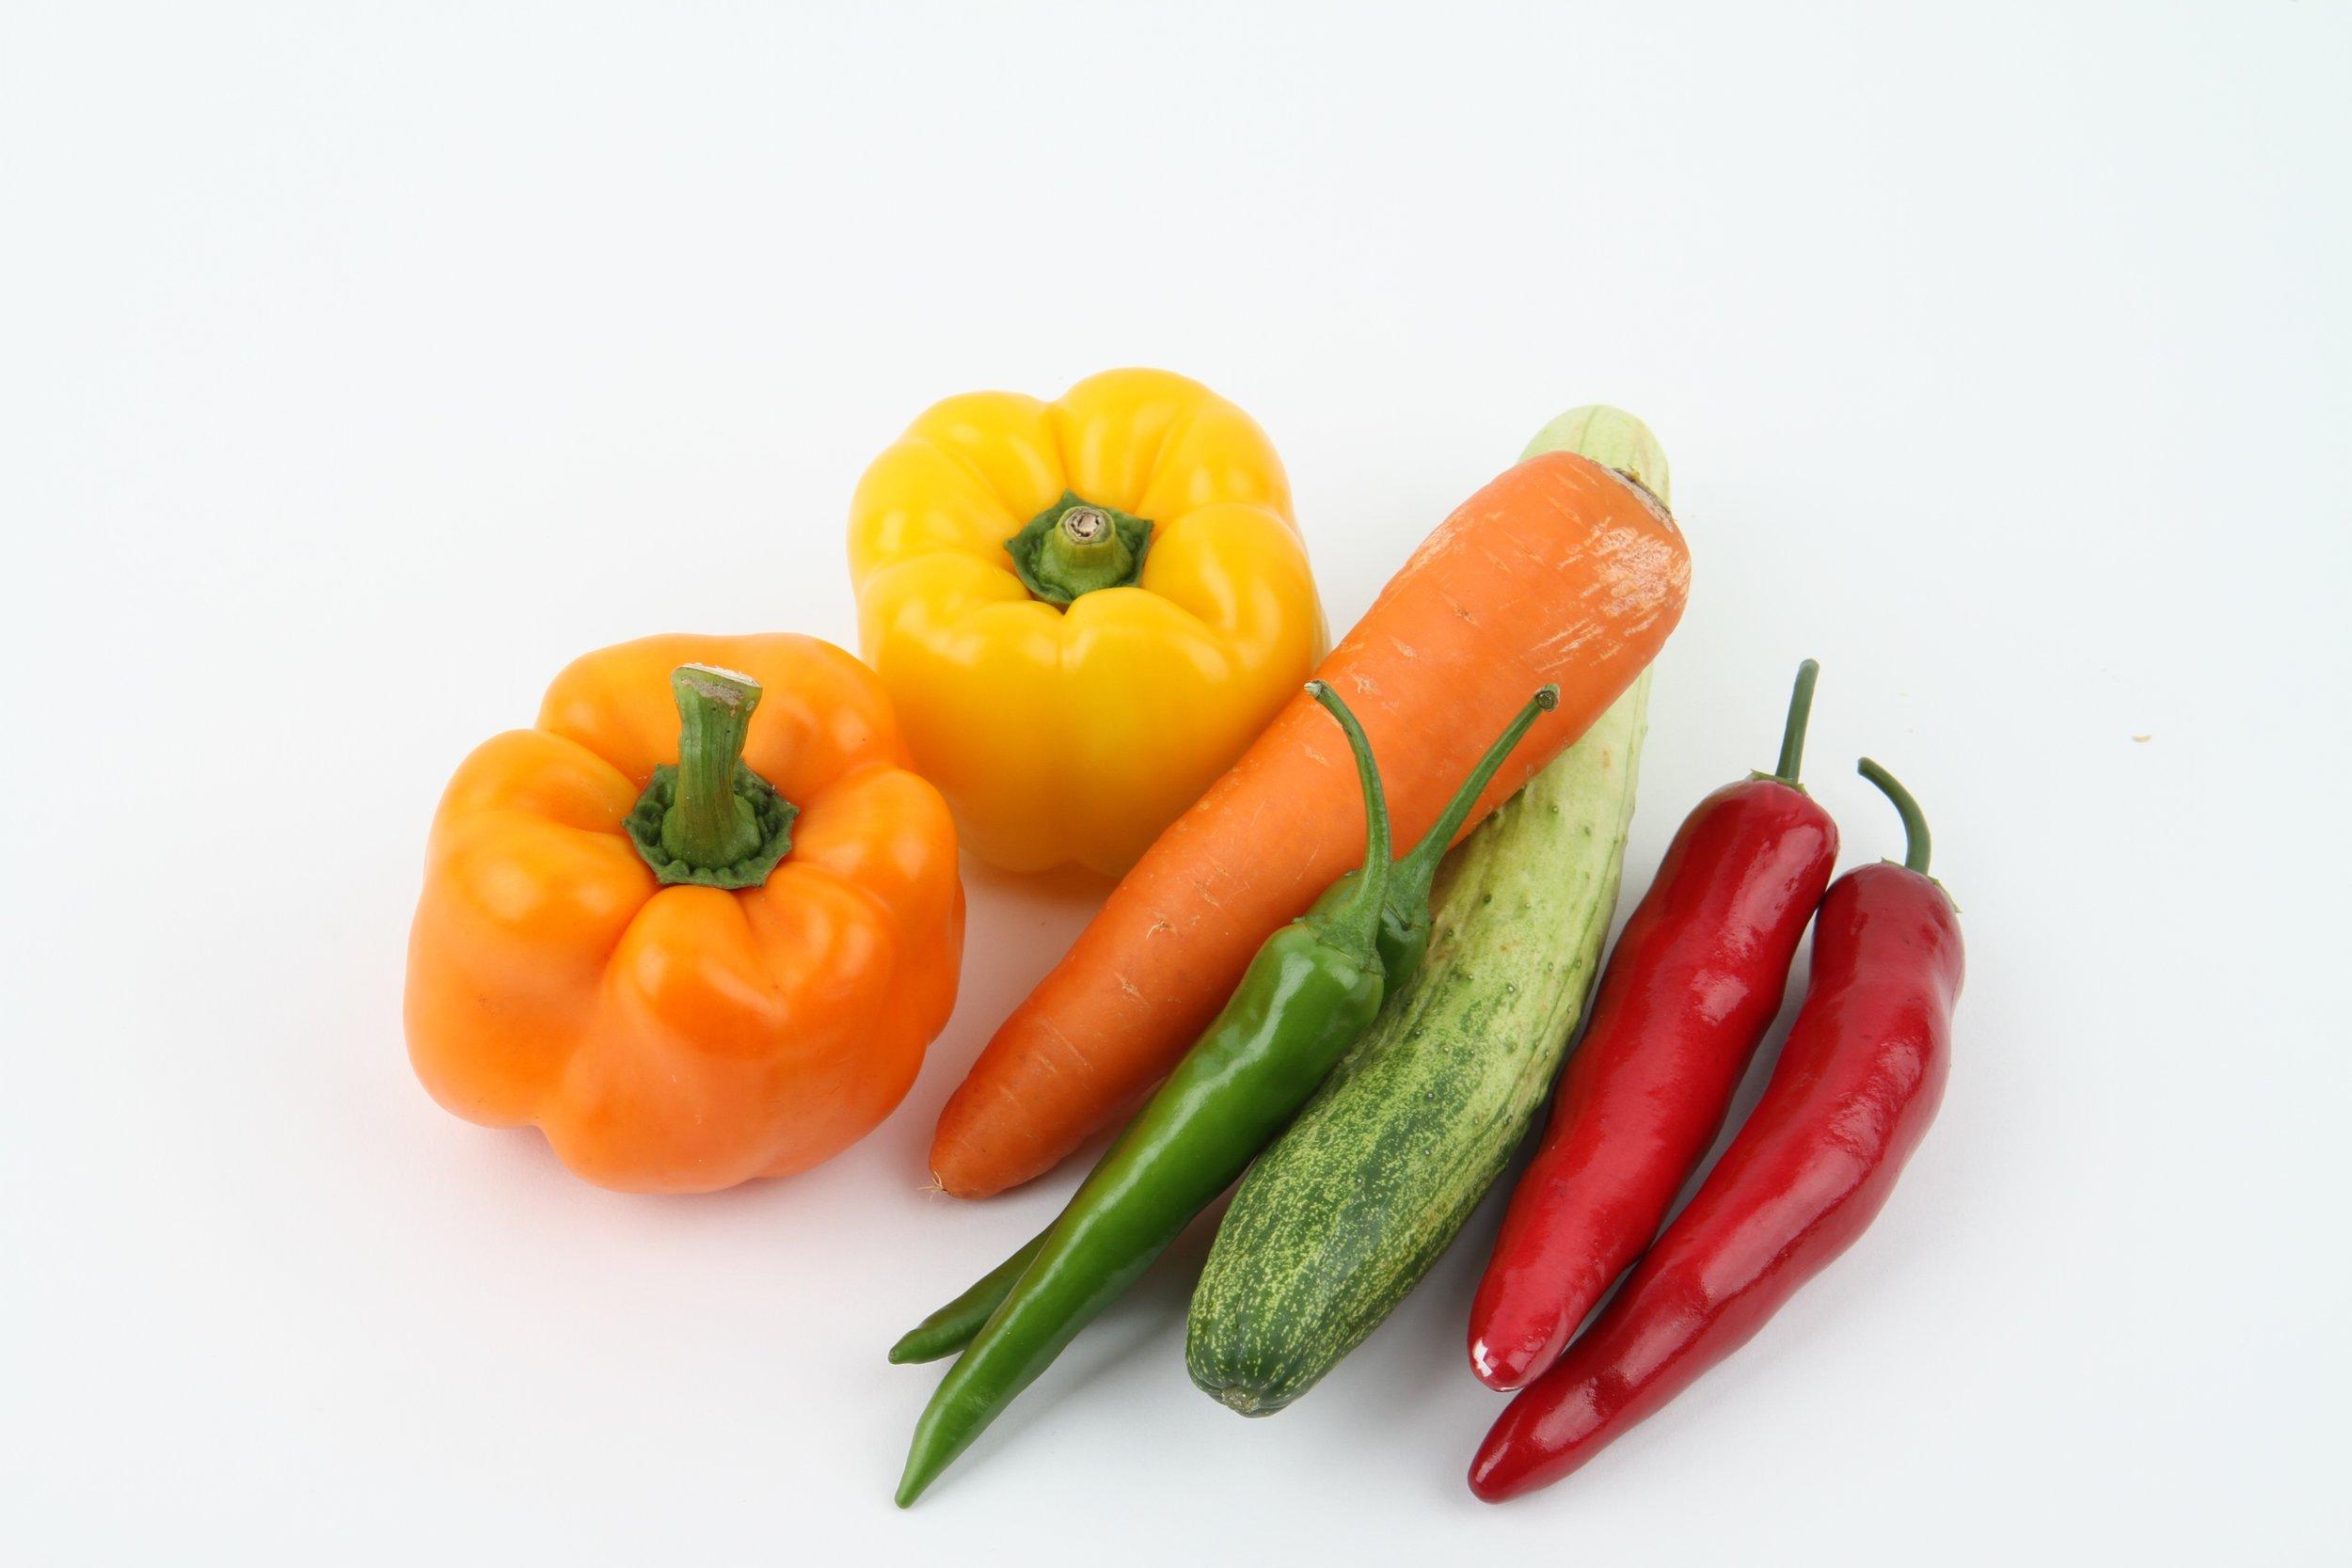 carrots-onion-cucumber-vegetables-67670.jpeg